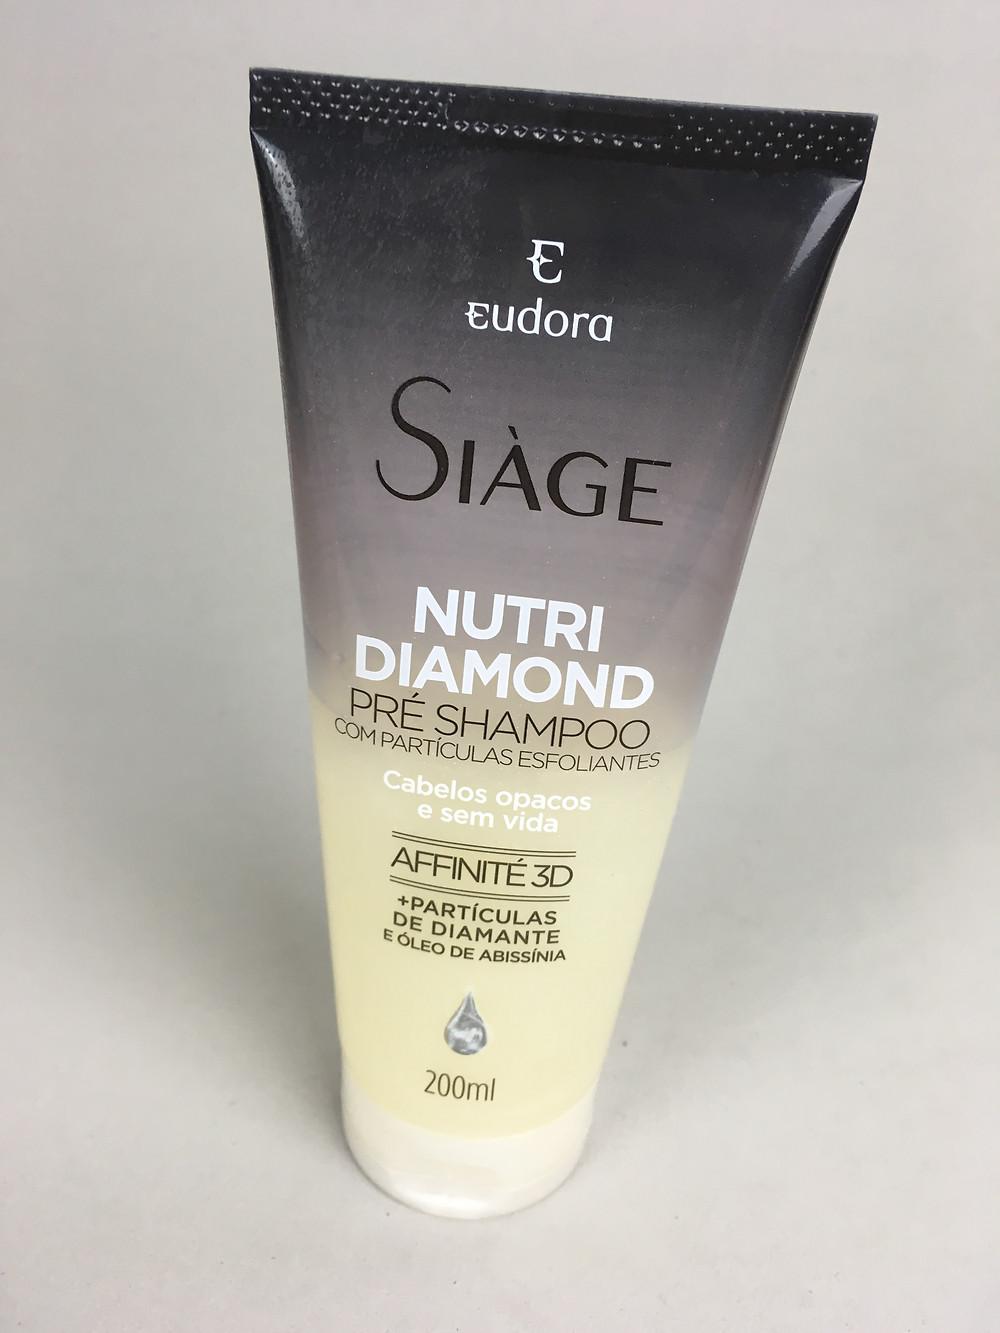 Nutri Diamond Pré-Shampoo Siàge Eudora